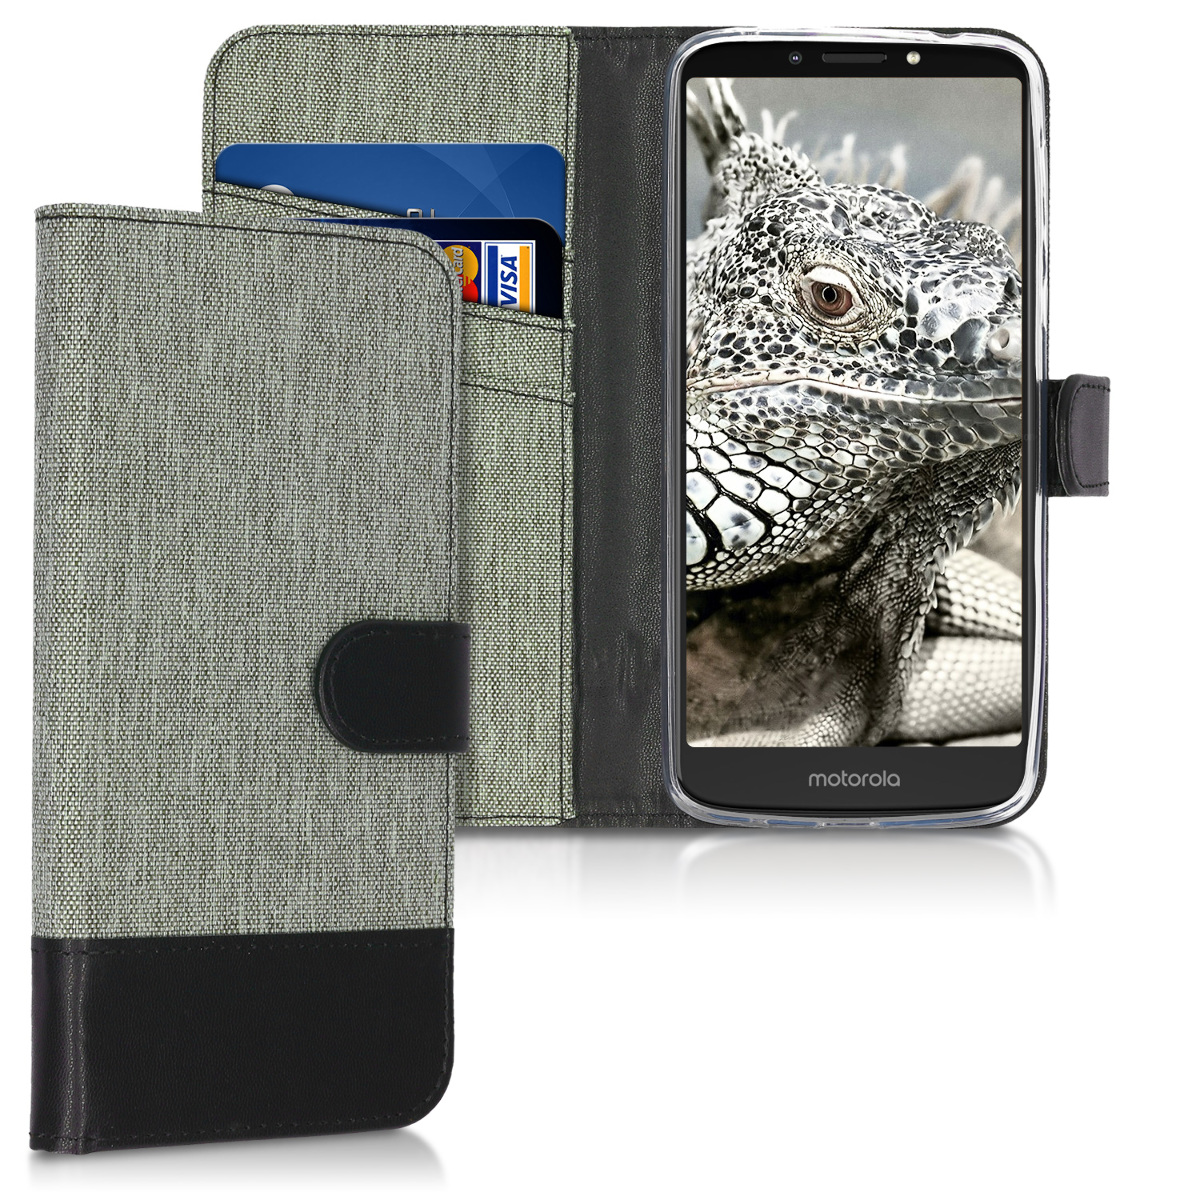 KW Θήκη Πορτοφόλι Motorola Moto E5 Plus - Συνθετικό δέρμα - Grey / Black (45032.01)